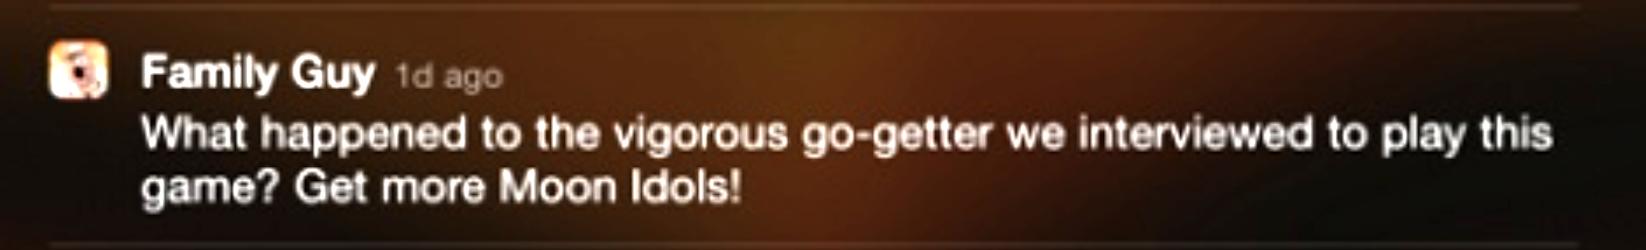 push notifications games